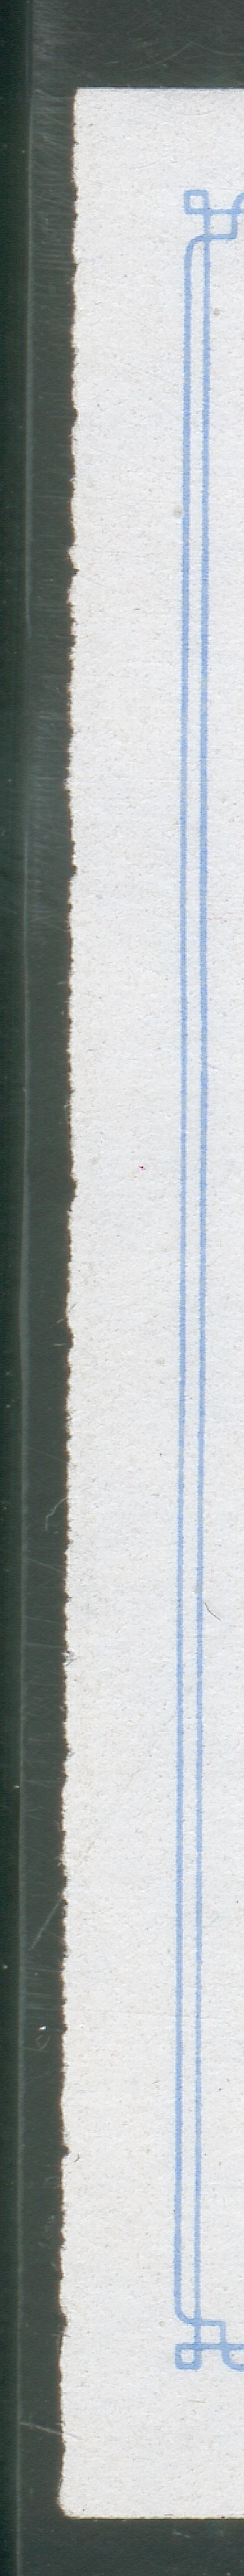 hk45-2.jpg